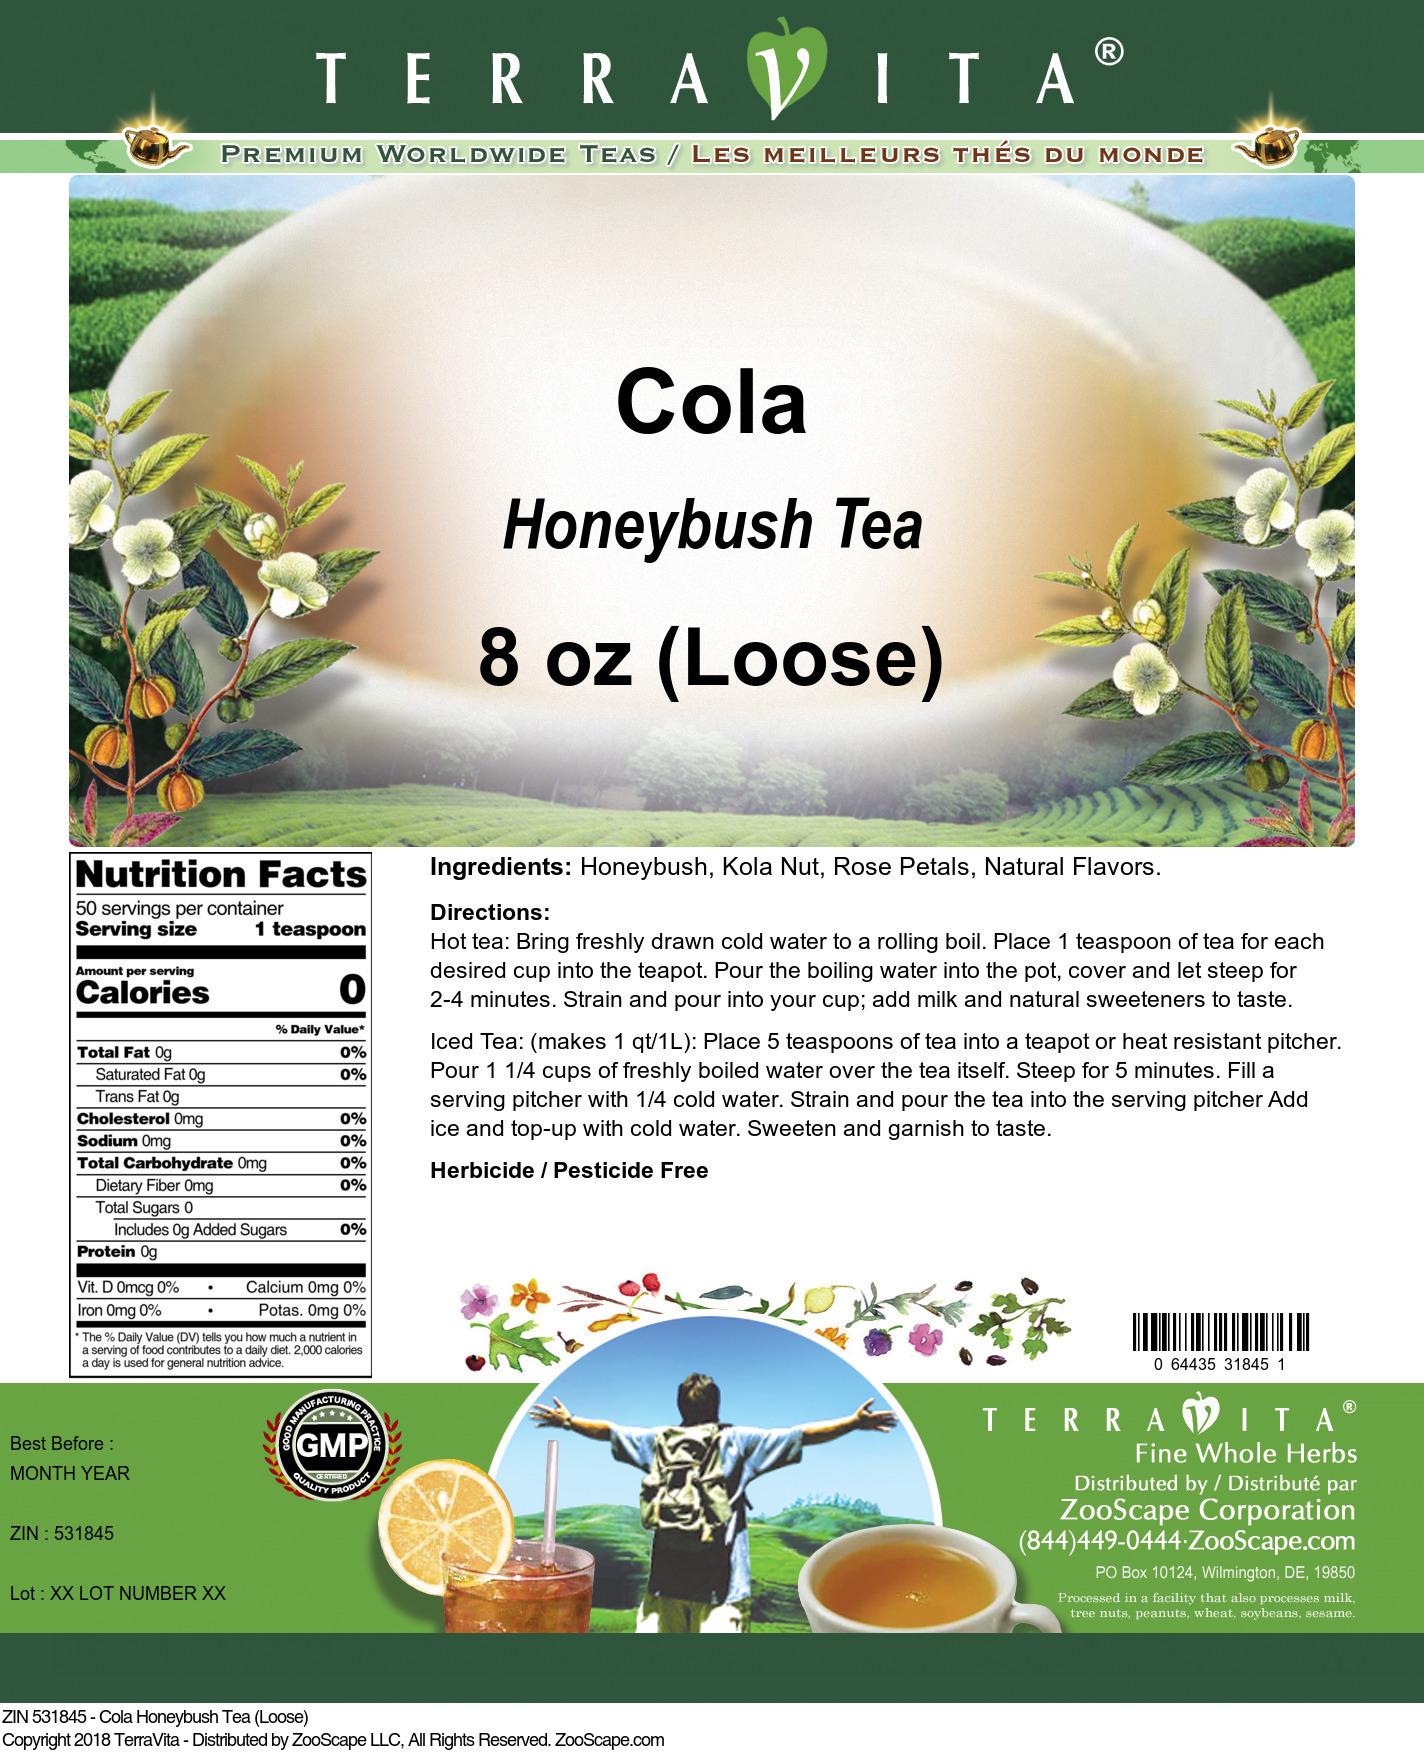 Cola Honeybush Tea